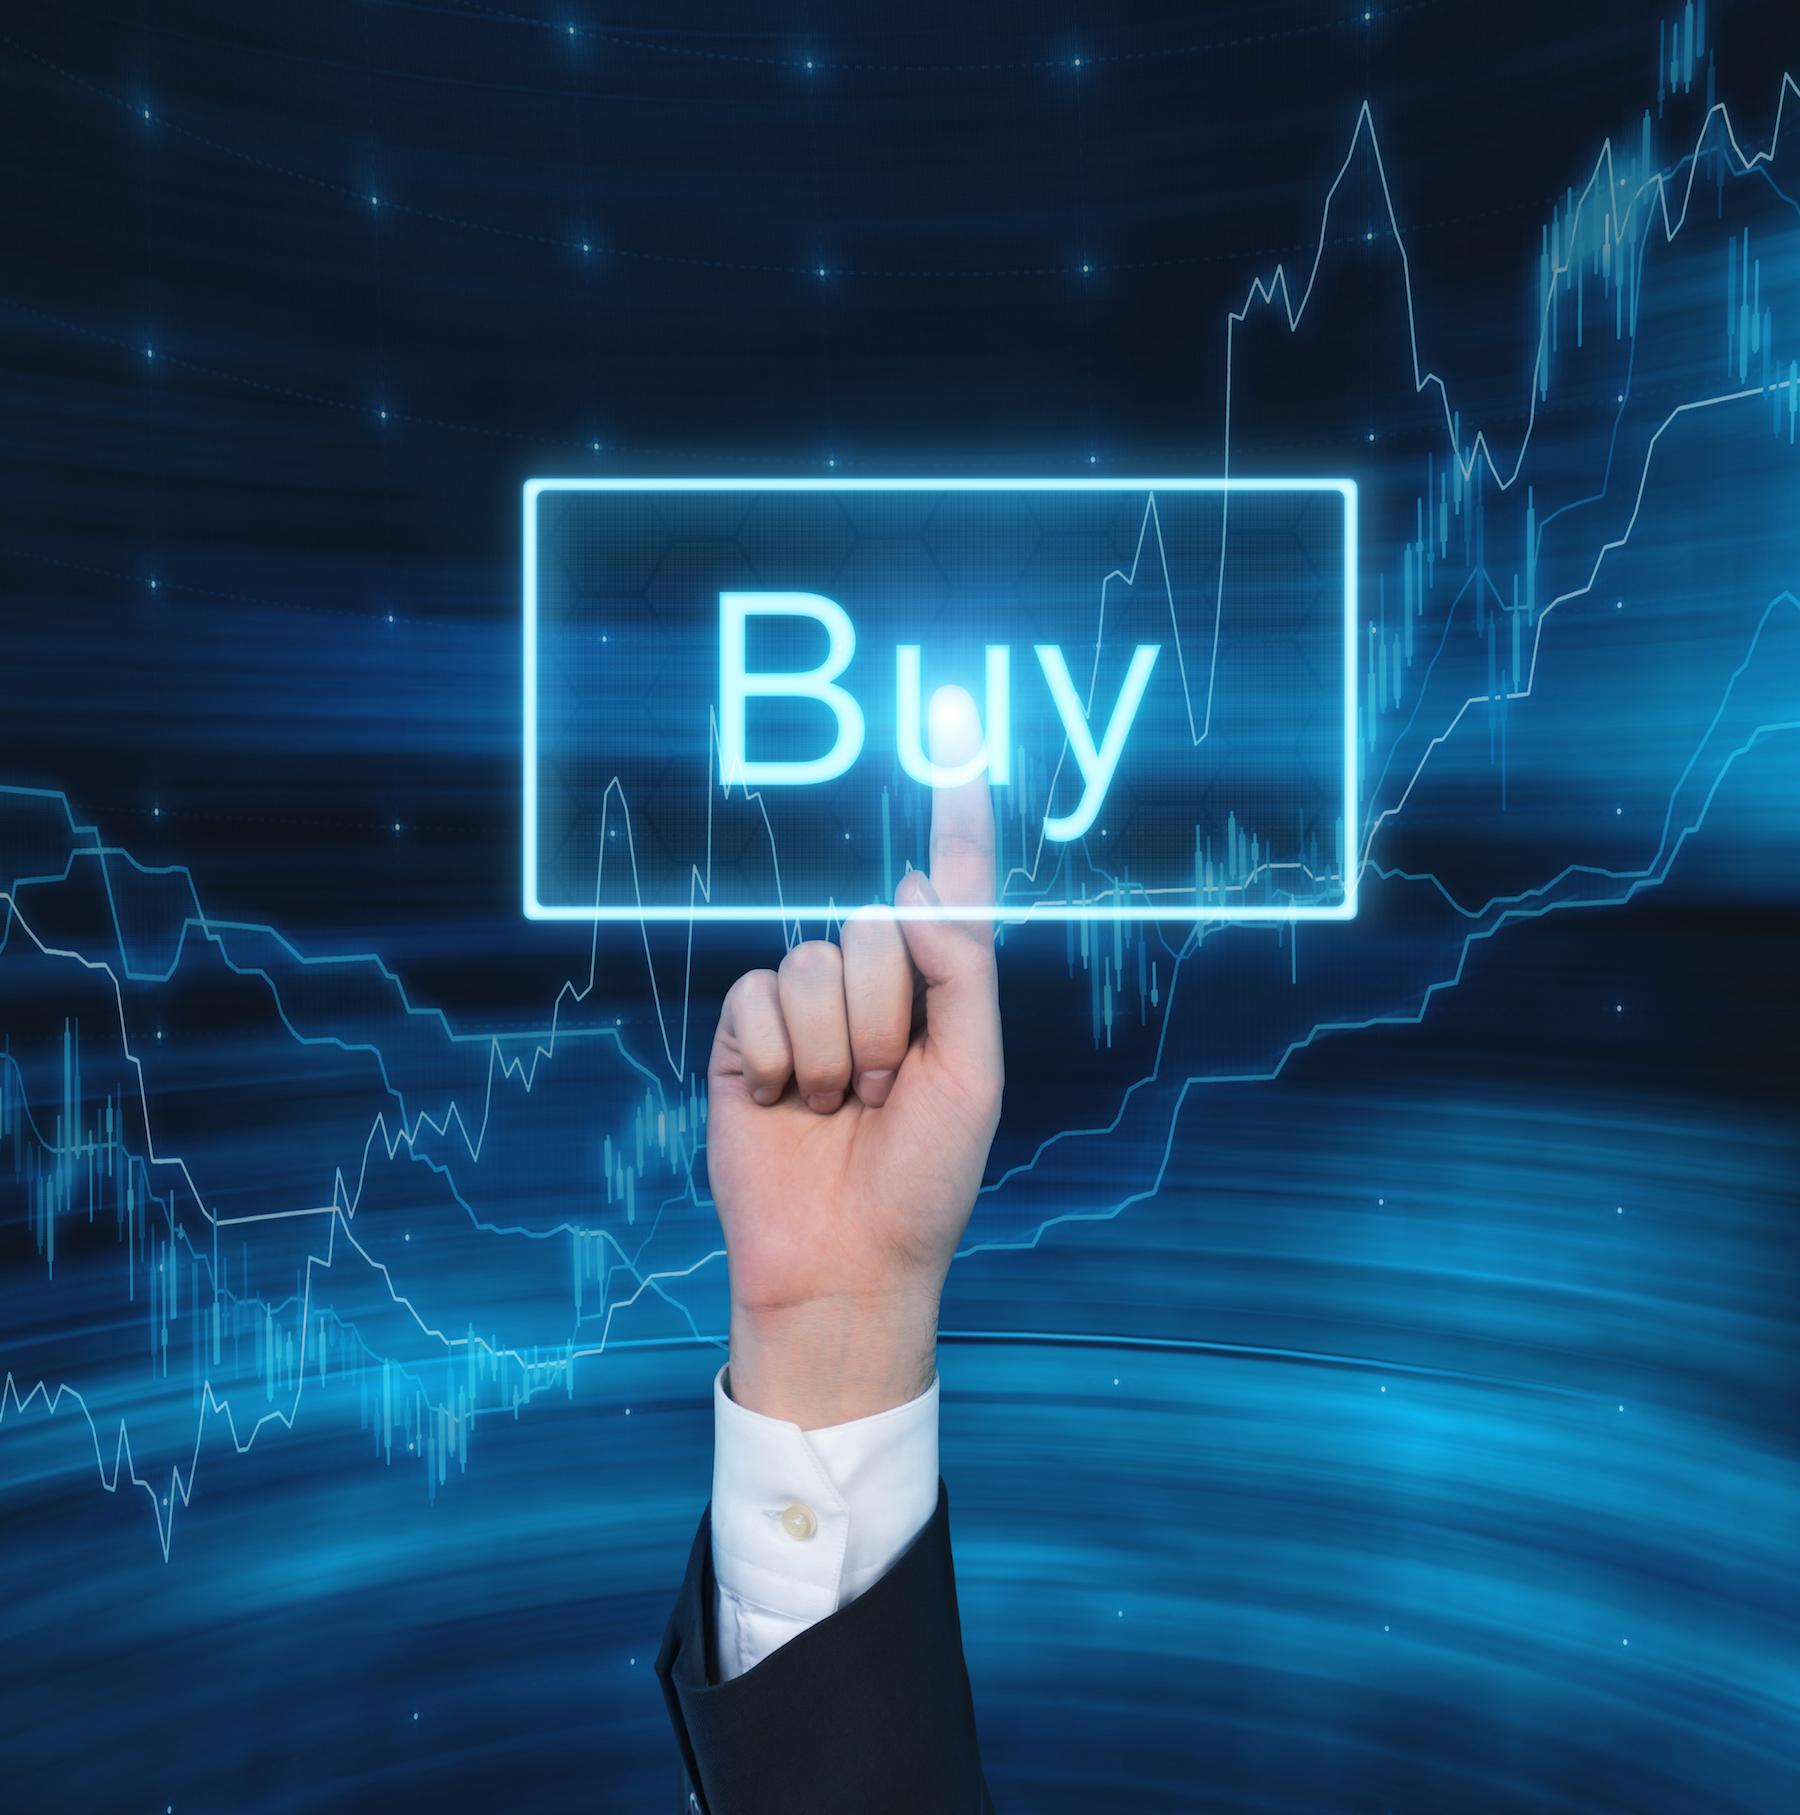 e12e520a896f9 3 Top Small-Cap Stocks to Buy Right Now - Option Sensei